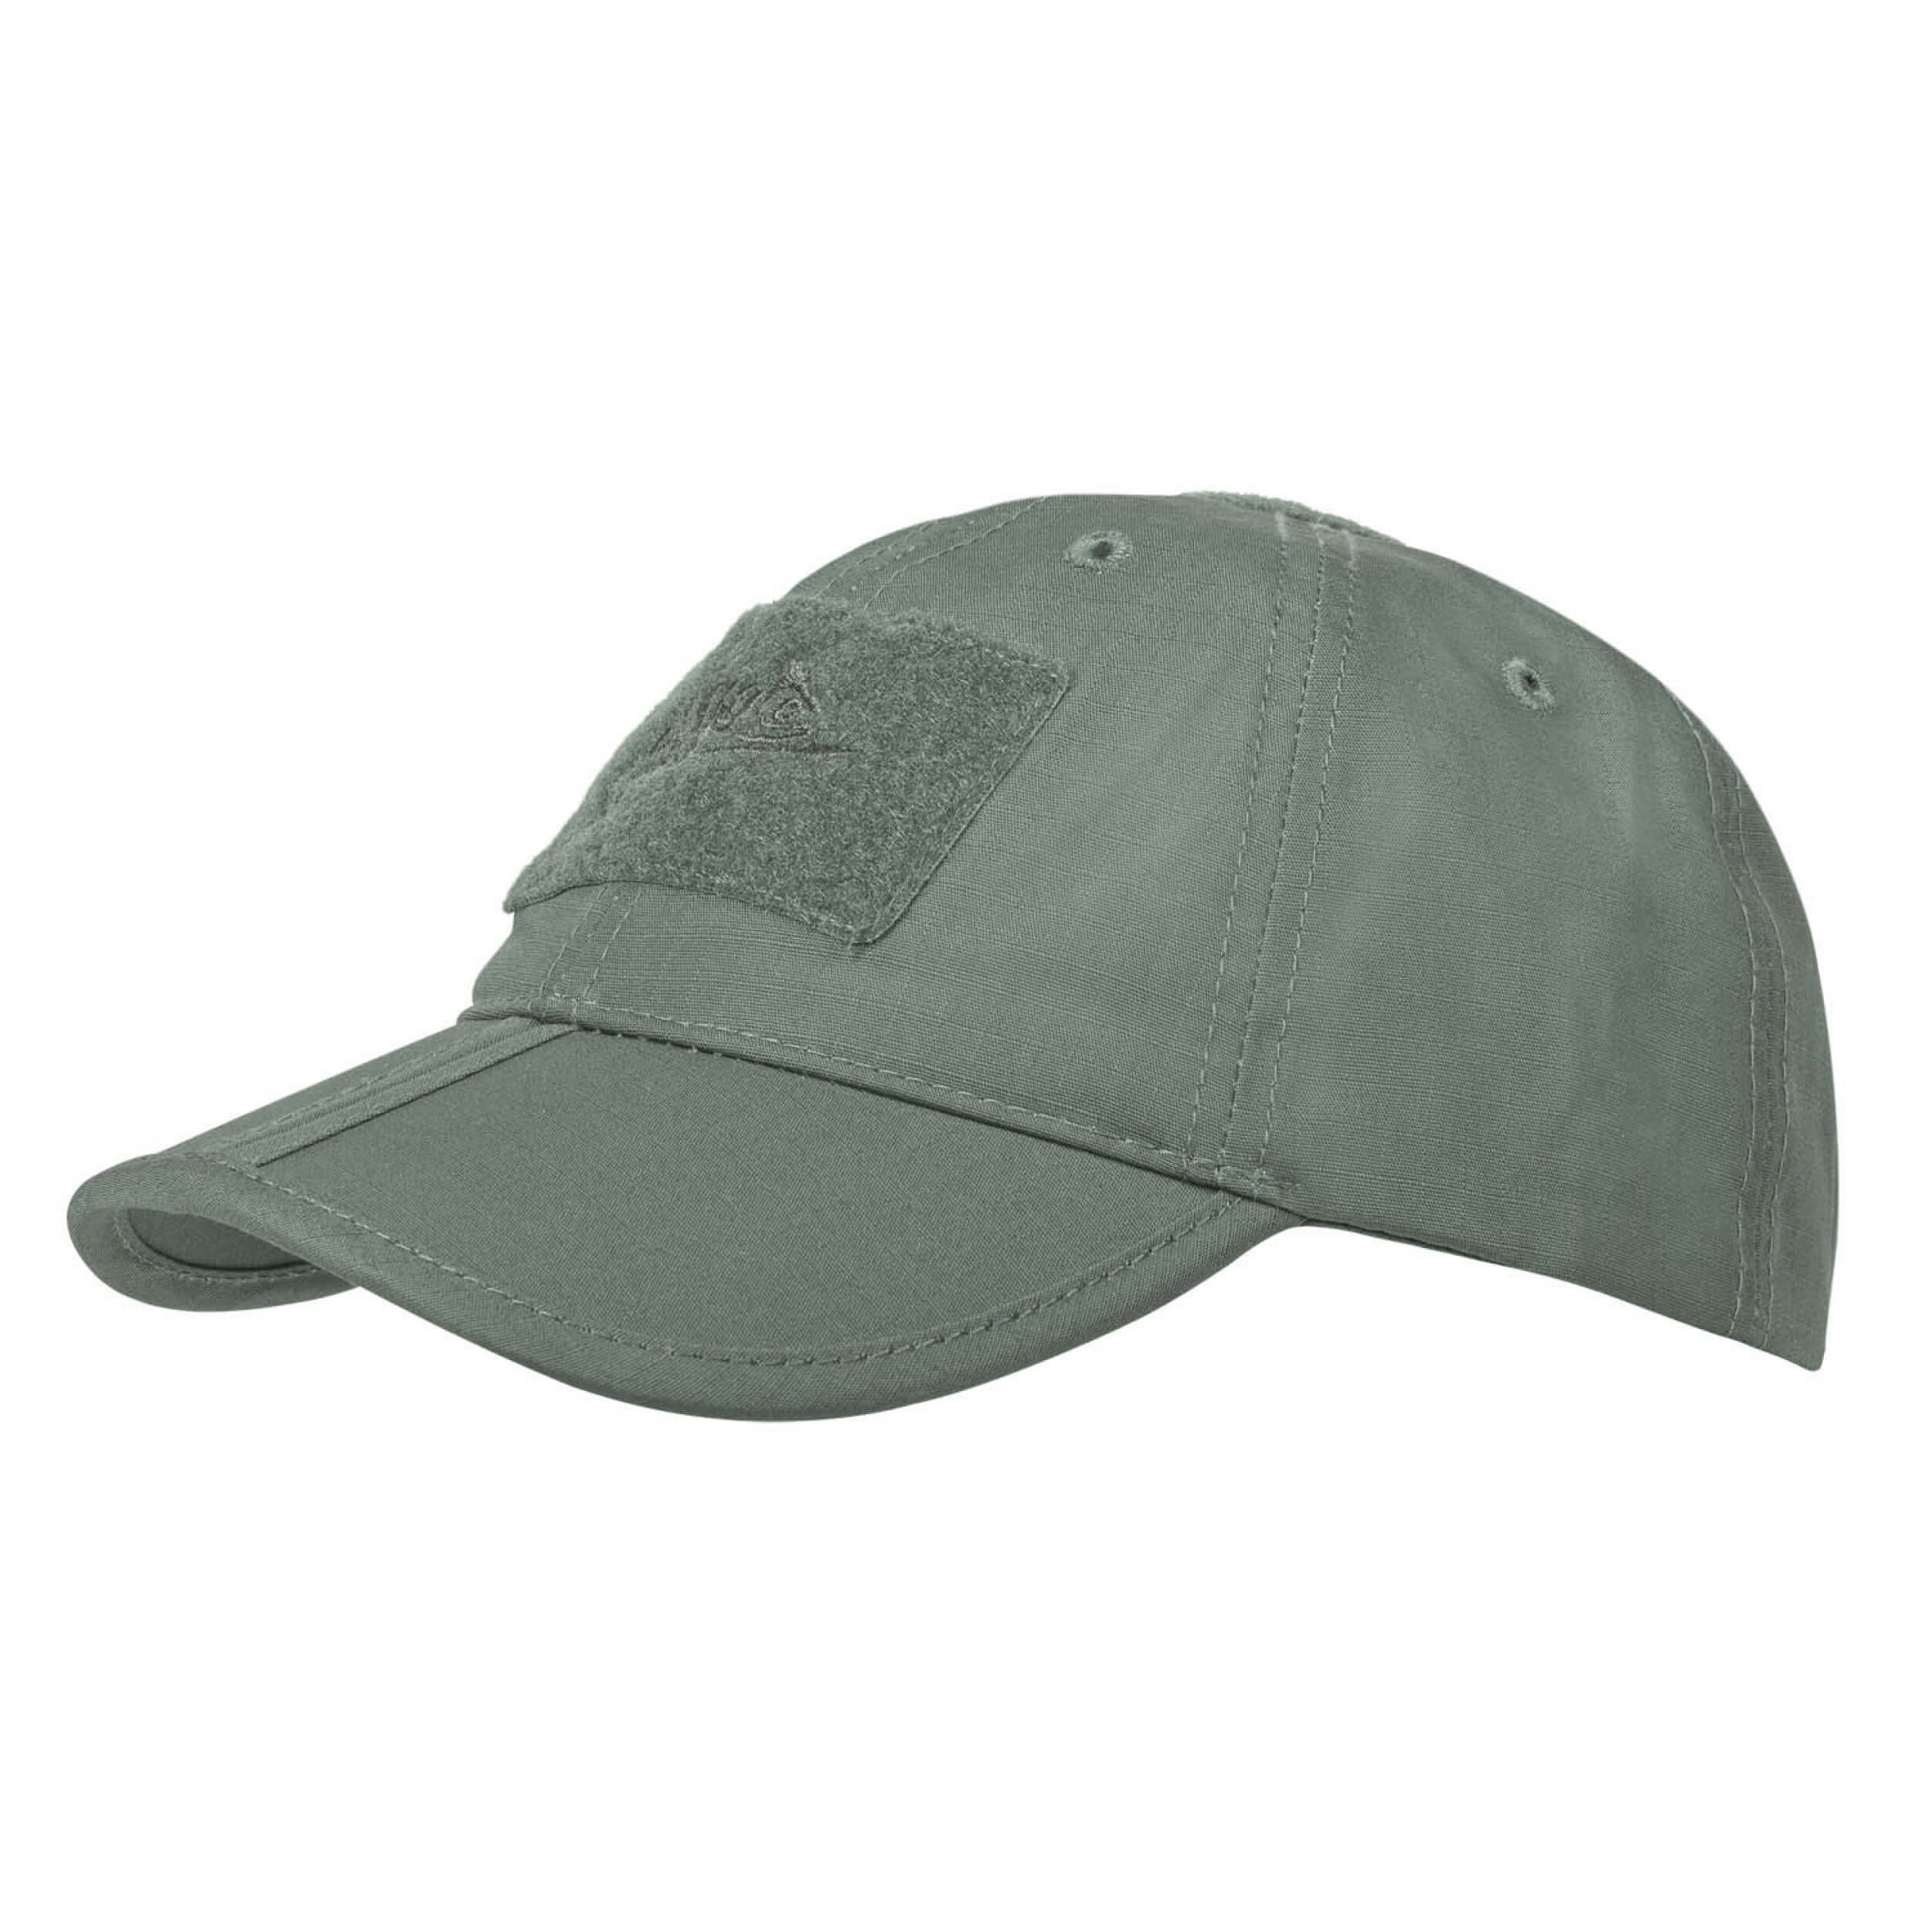 Helikon-Tex Baseball Folding Cap -PolyCotton Ripstop- Olive Drab